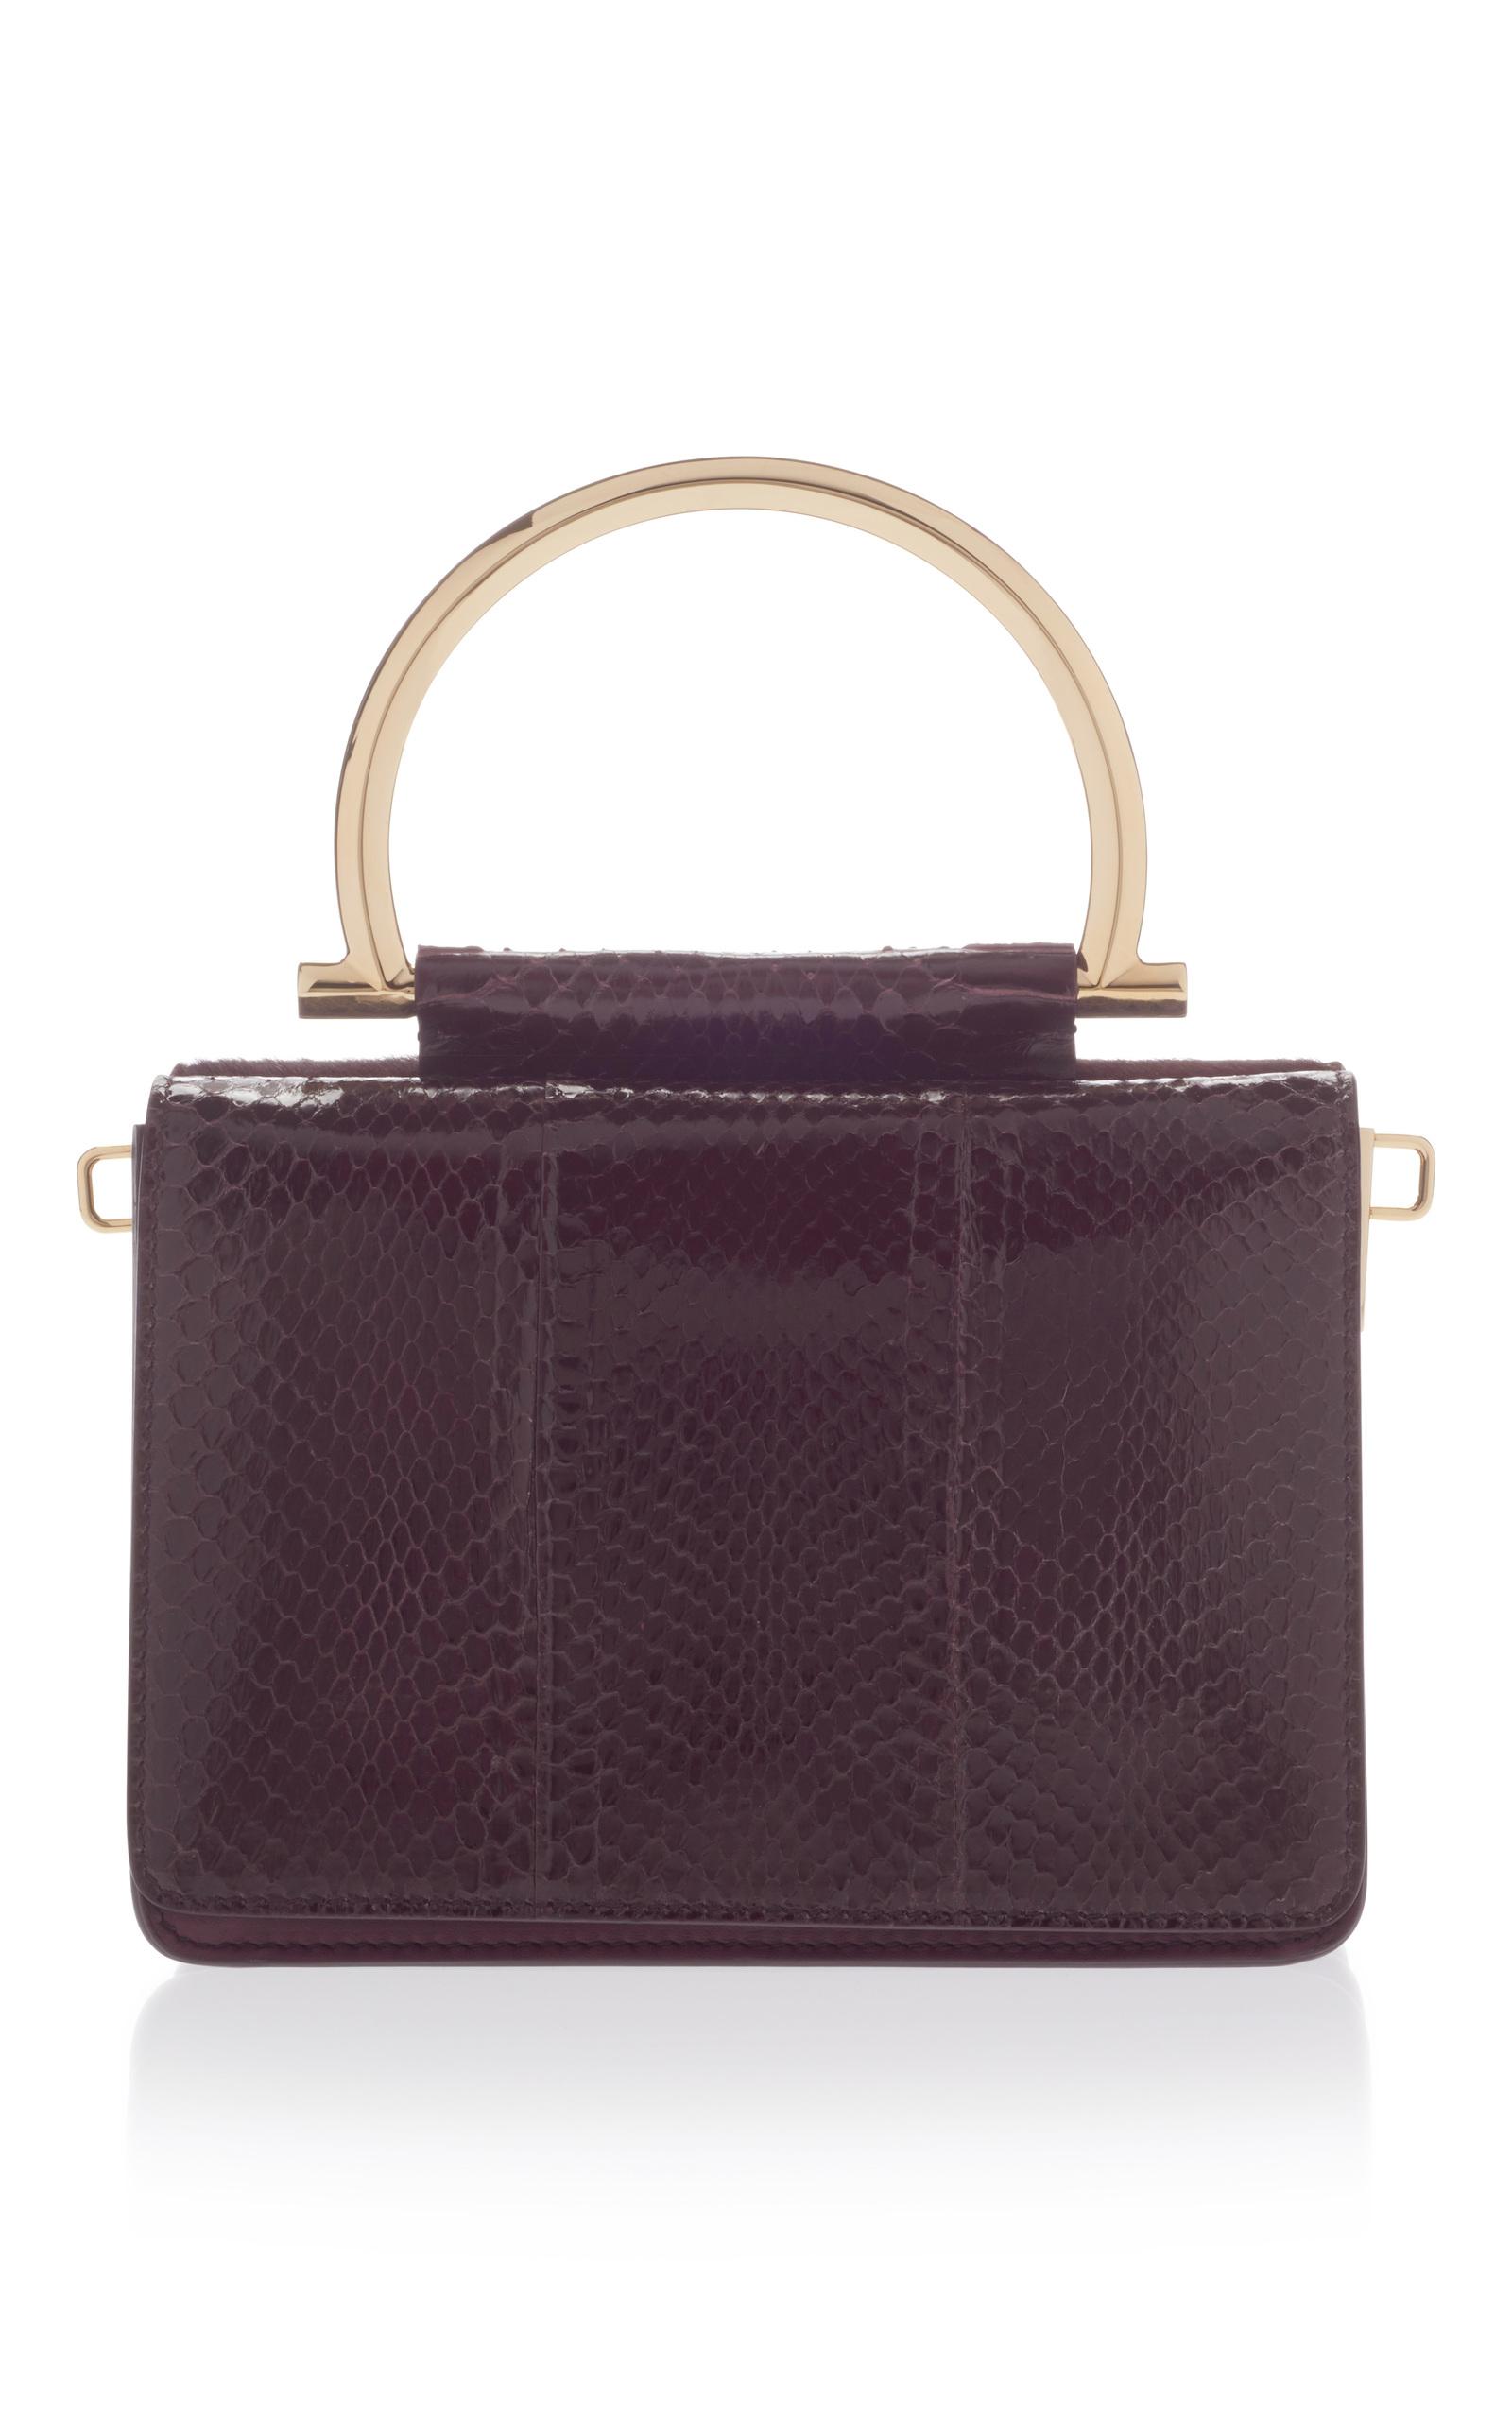 6e6c302da7 Mina Shoulder bag with Top Handle by Salvatore Ferragamo